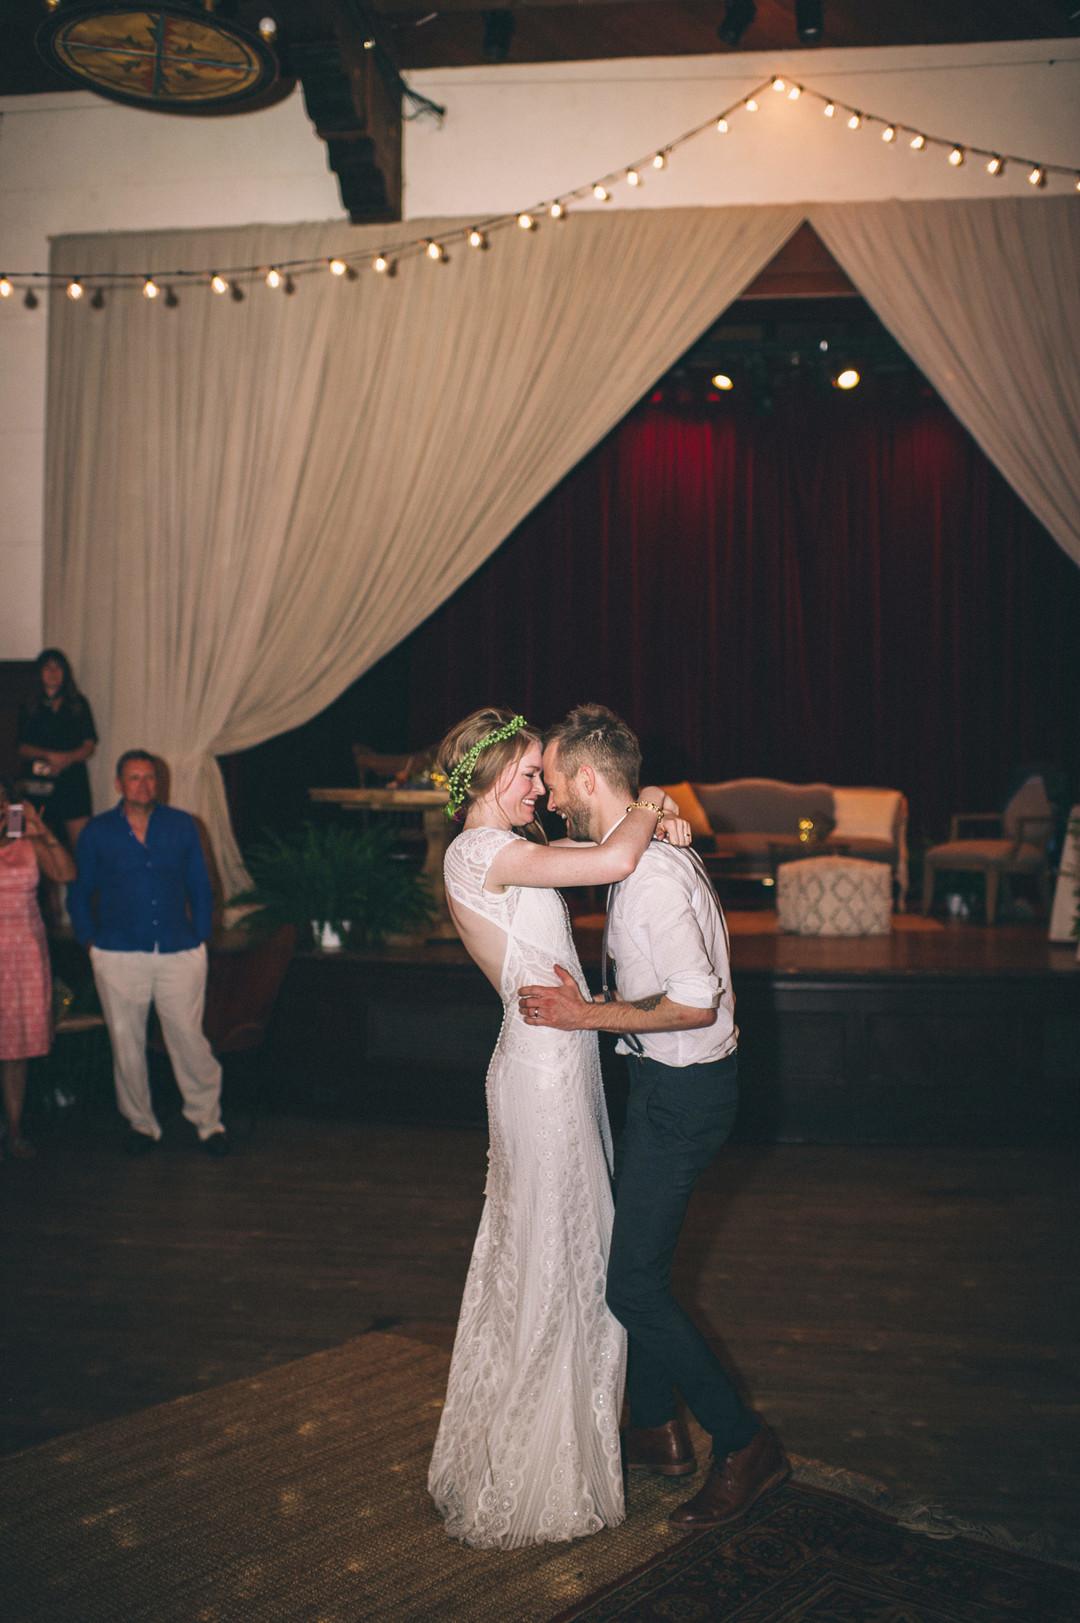 www.santabarbarawedding.com | Sarah Katherine Davis Photography | Santa Barbara Museum of Natural History | Wild Heart Events | DJ Michael Easbey | Bride and Groom Share a Dance